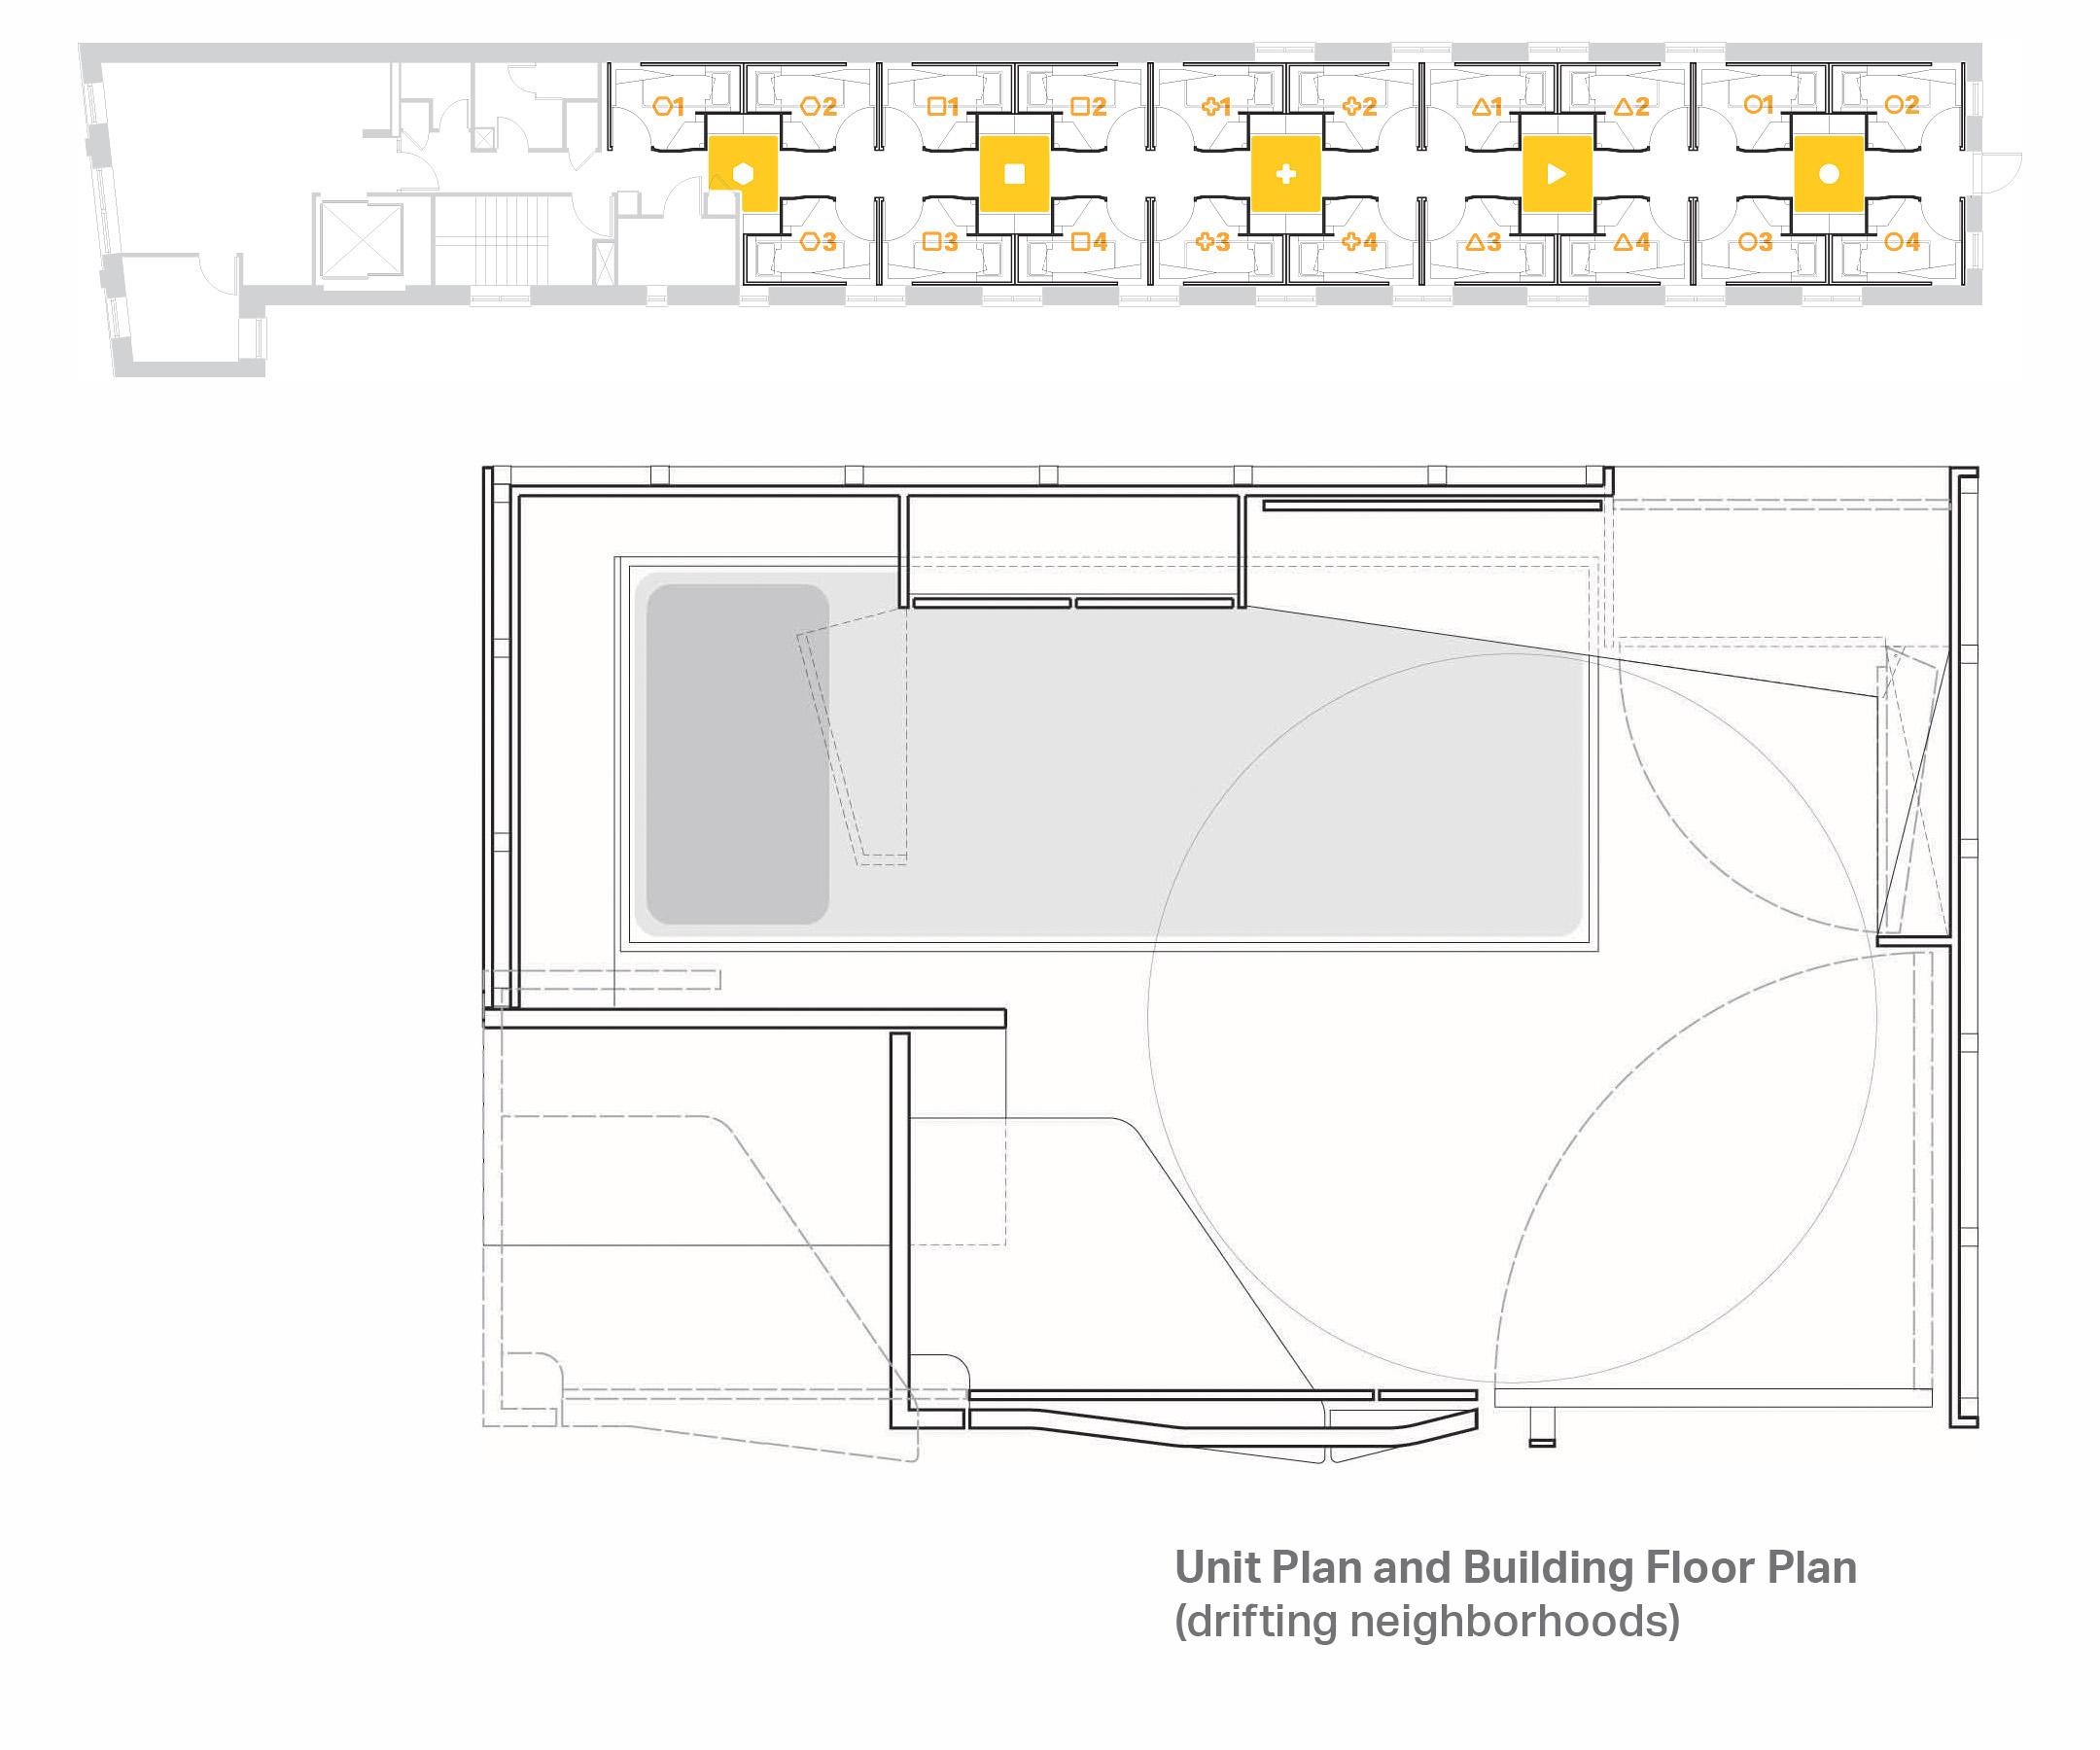 03_Drift_Prototype Plan.jpg